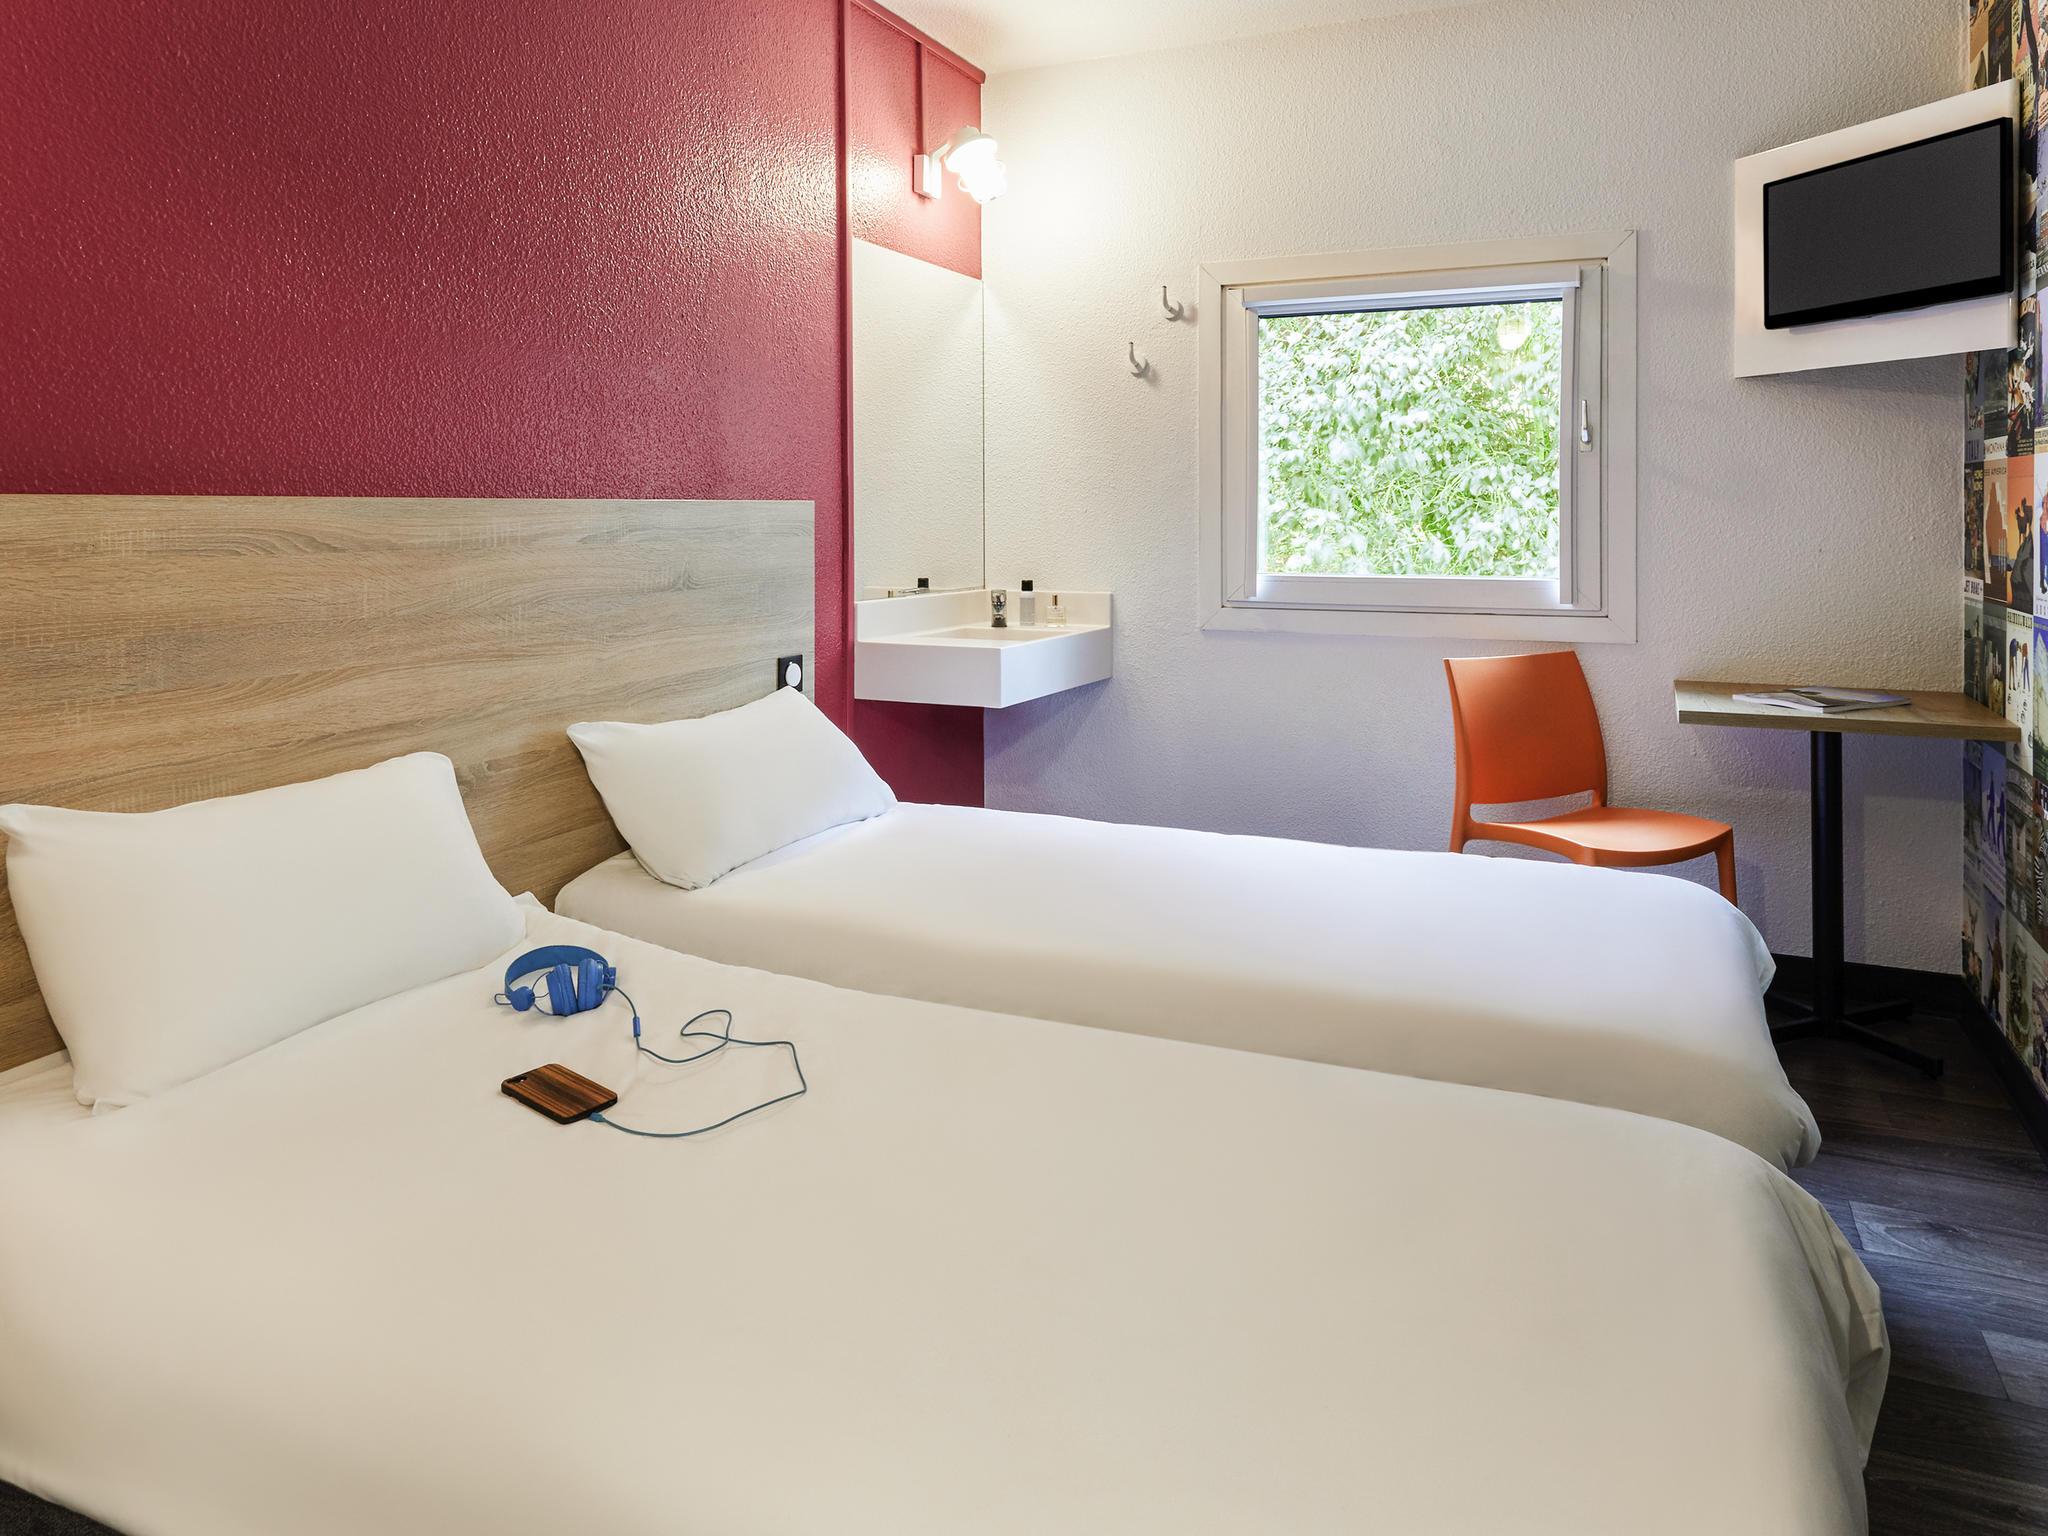 ホテル – hotelF1 Rungis Orly (rénové)